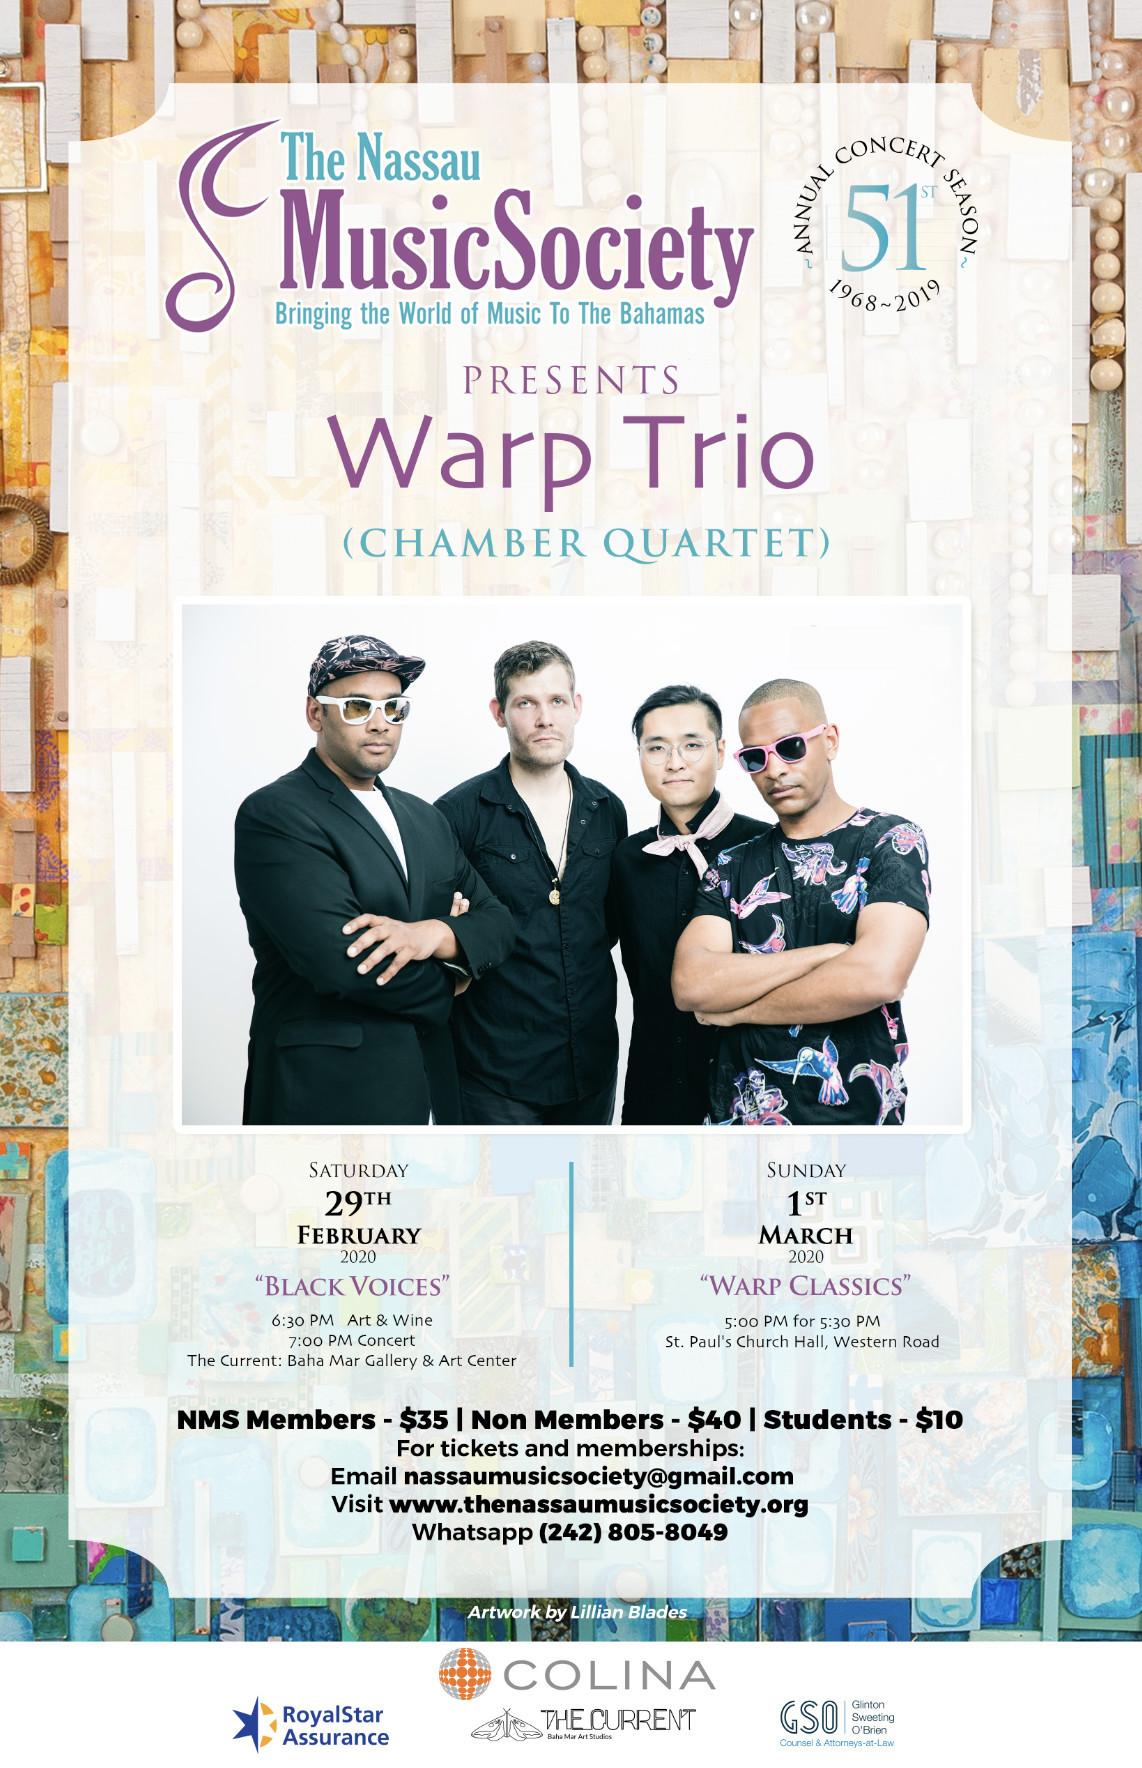 Warp Trio